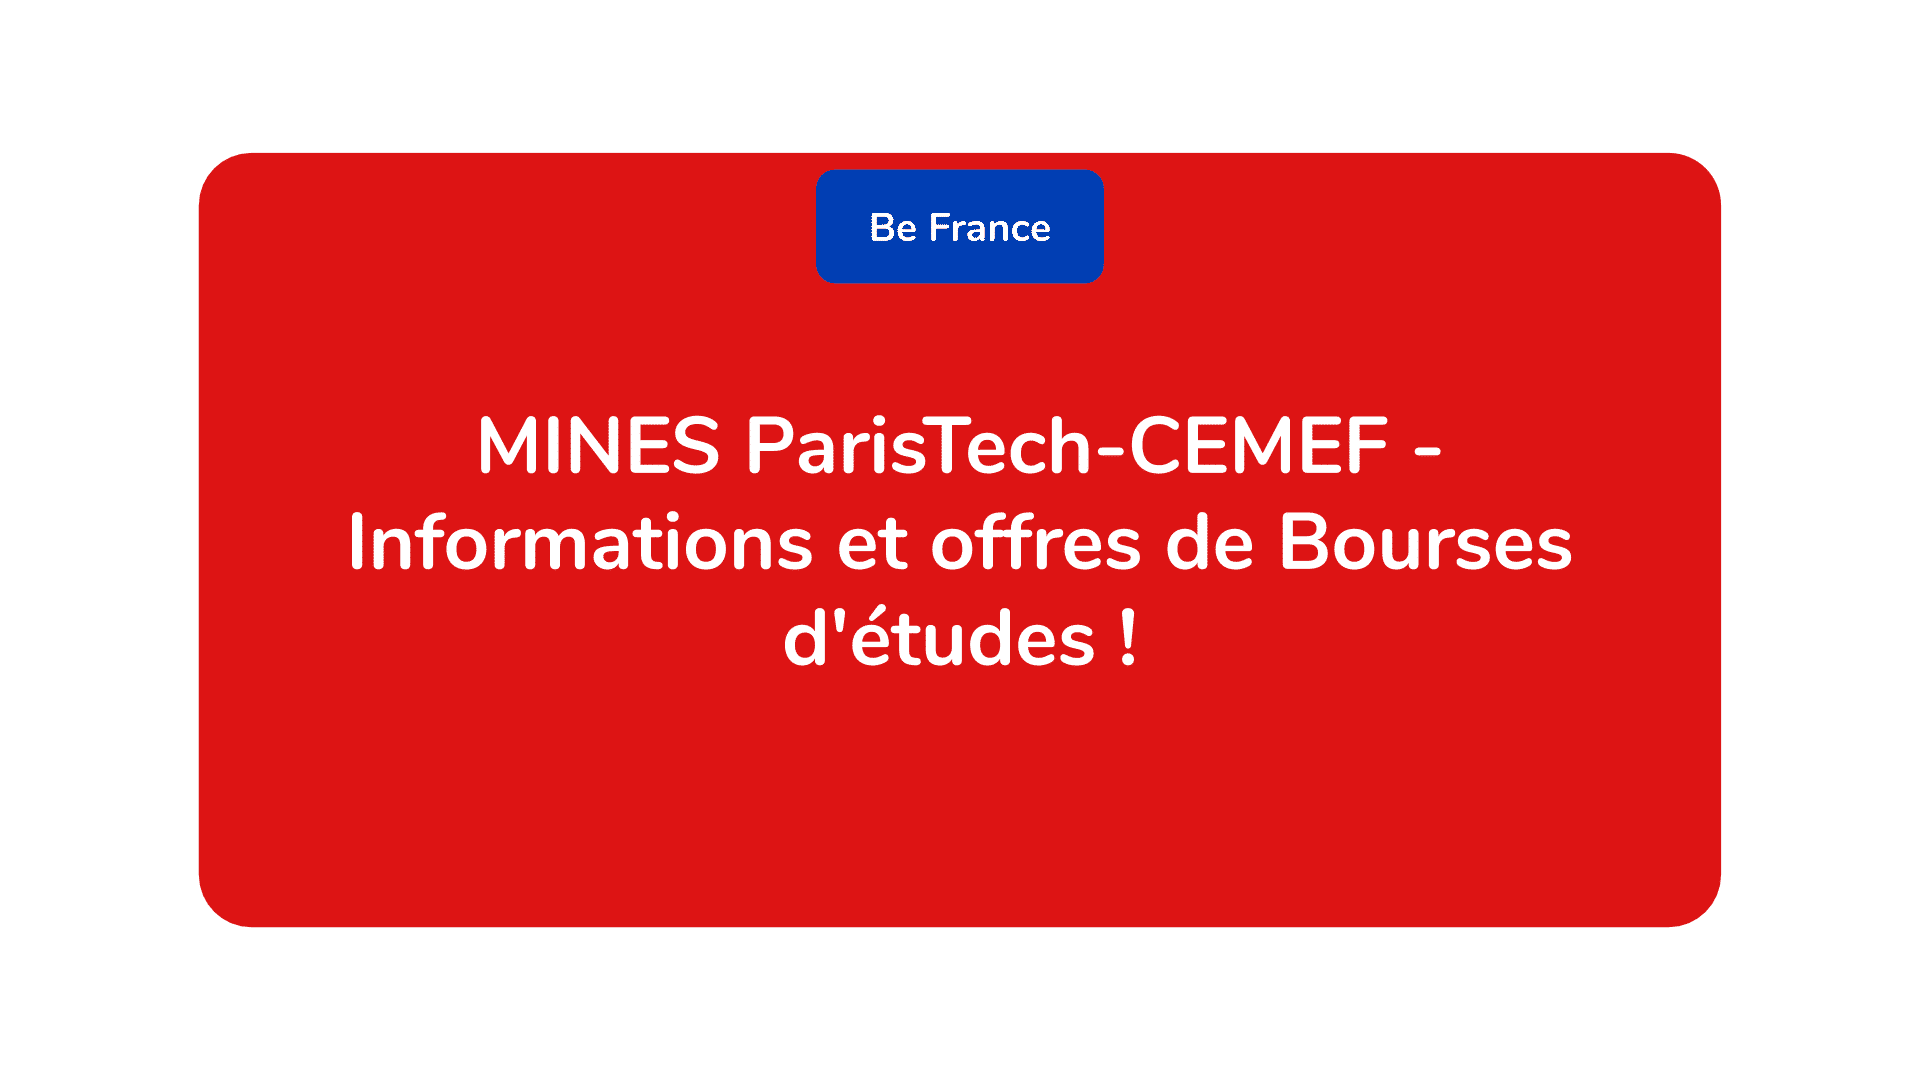 MINES ParisTech-CEMEF